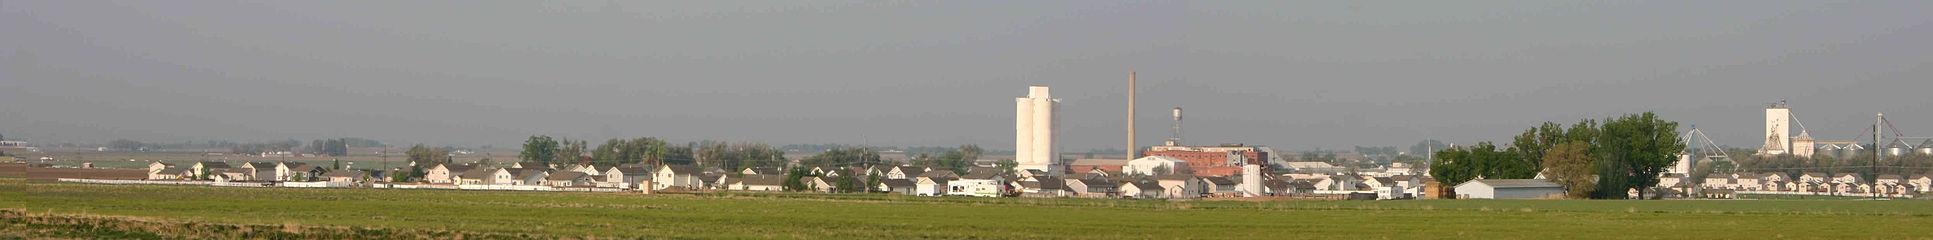 Image result for Eaton Colorado